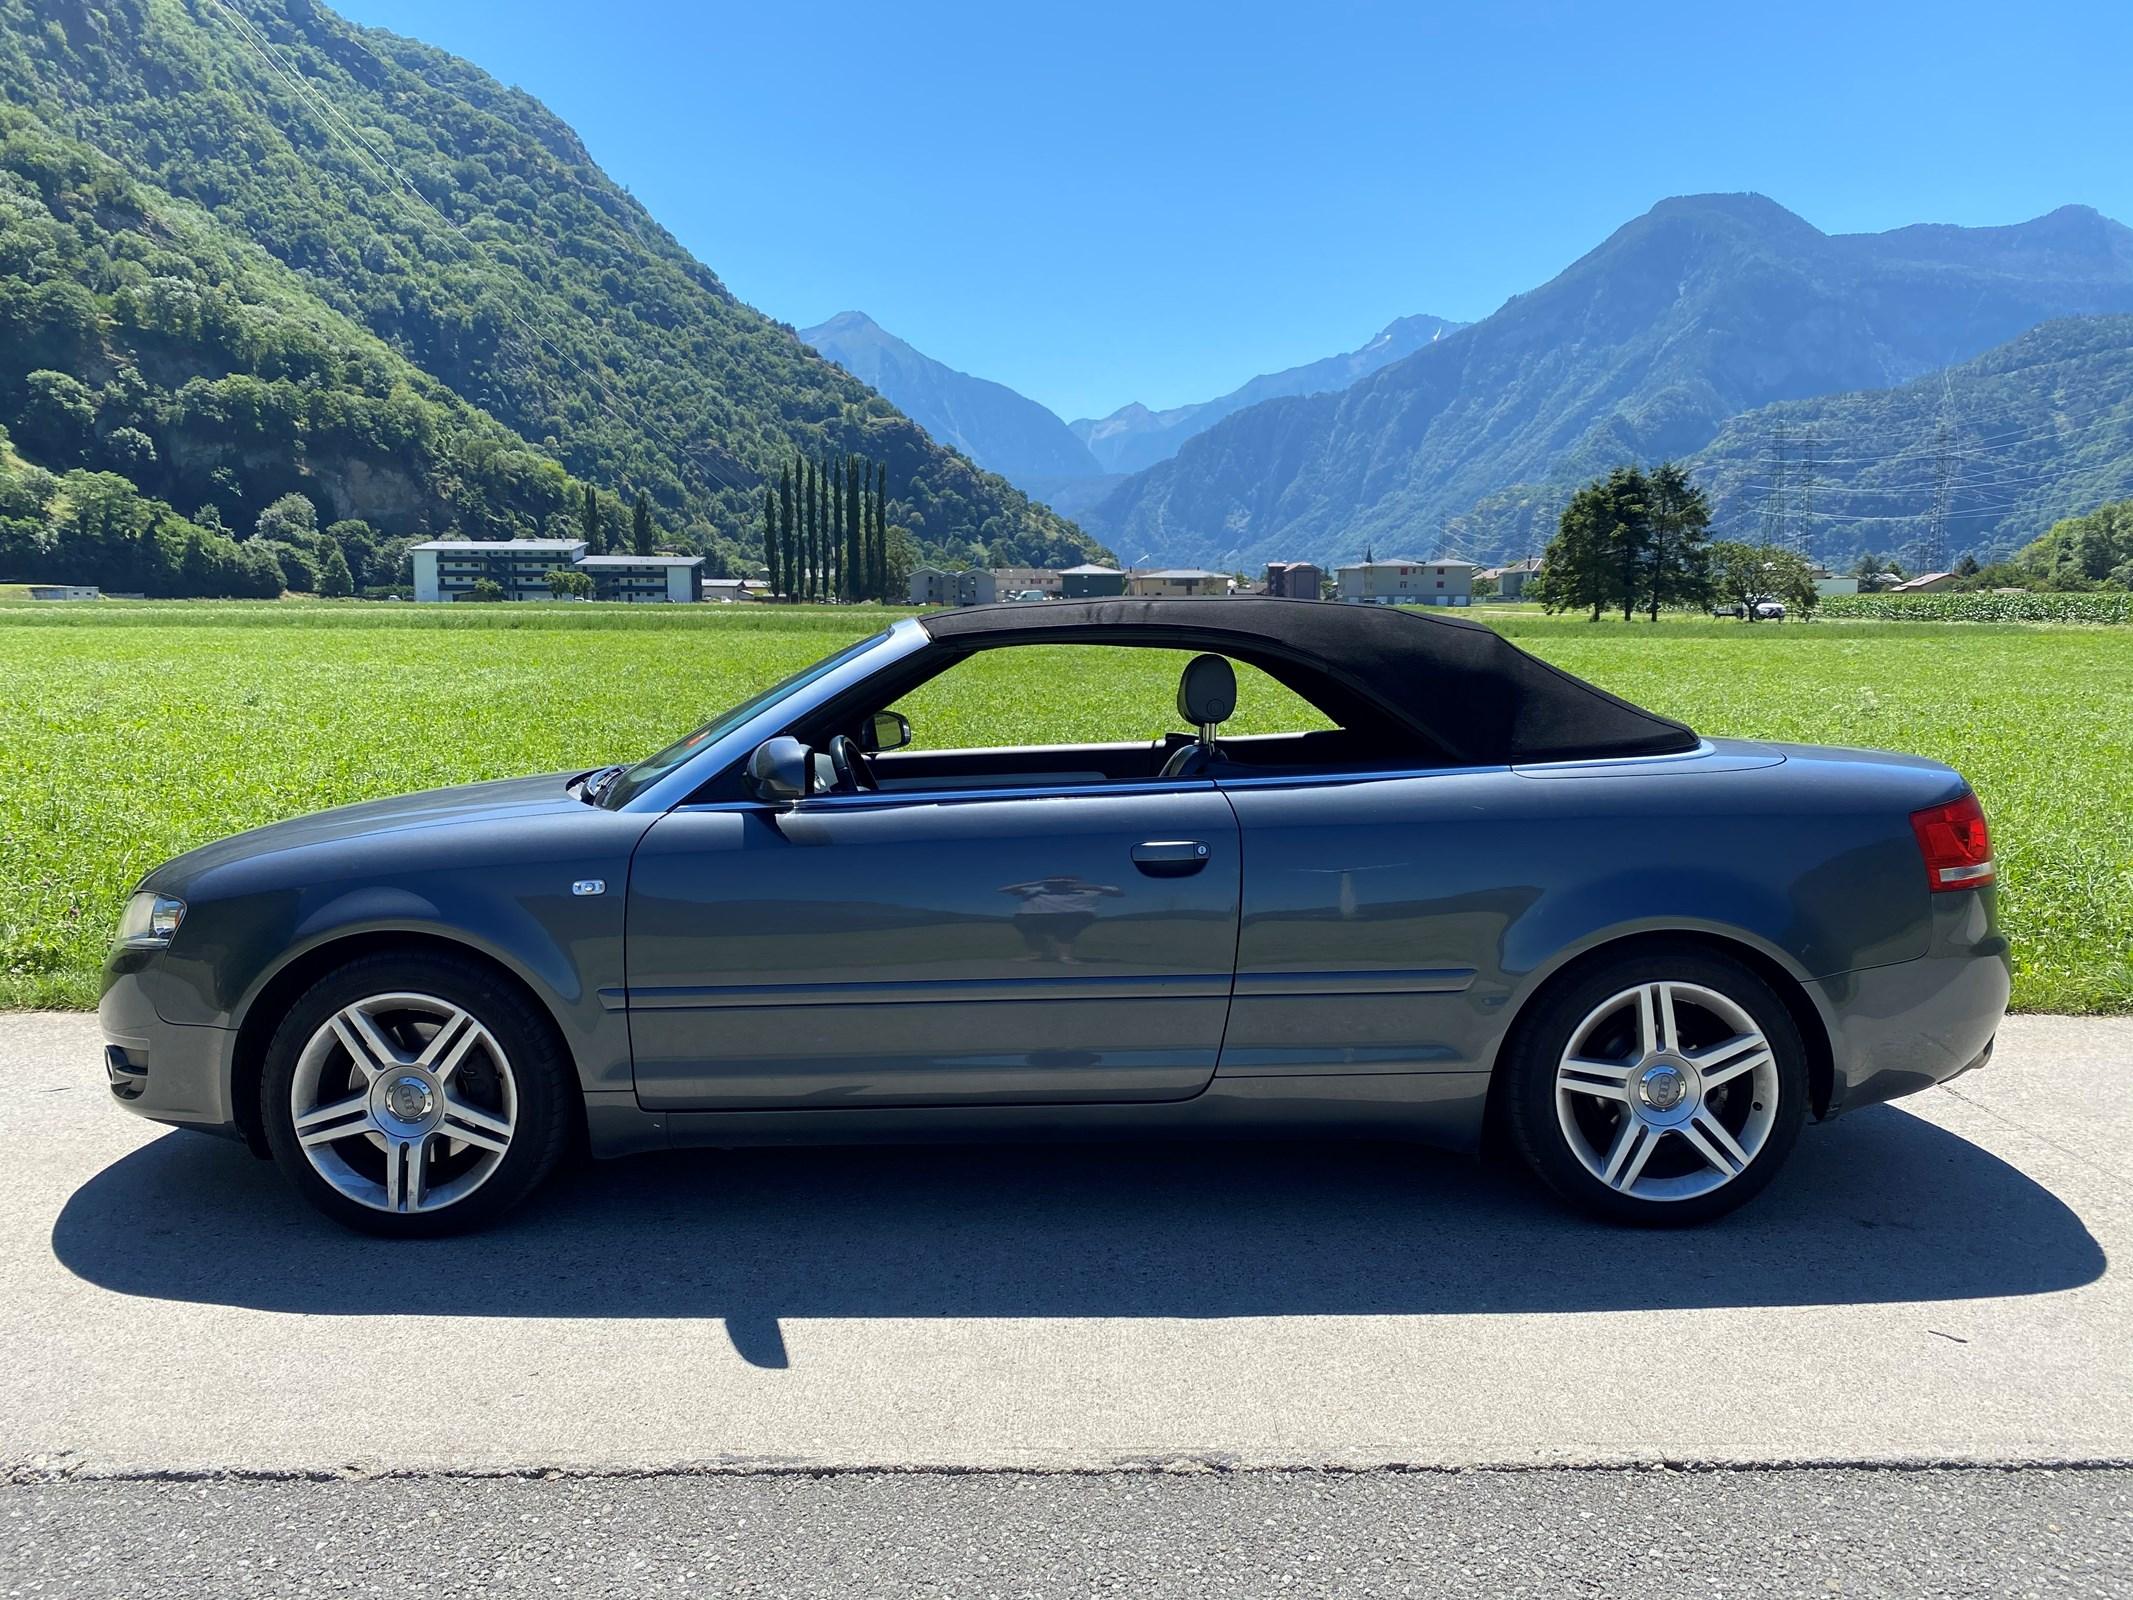 cabriolet Audi A4 Cabriolet 1.8 Turbo